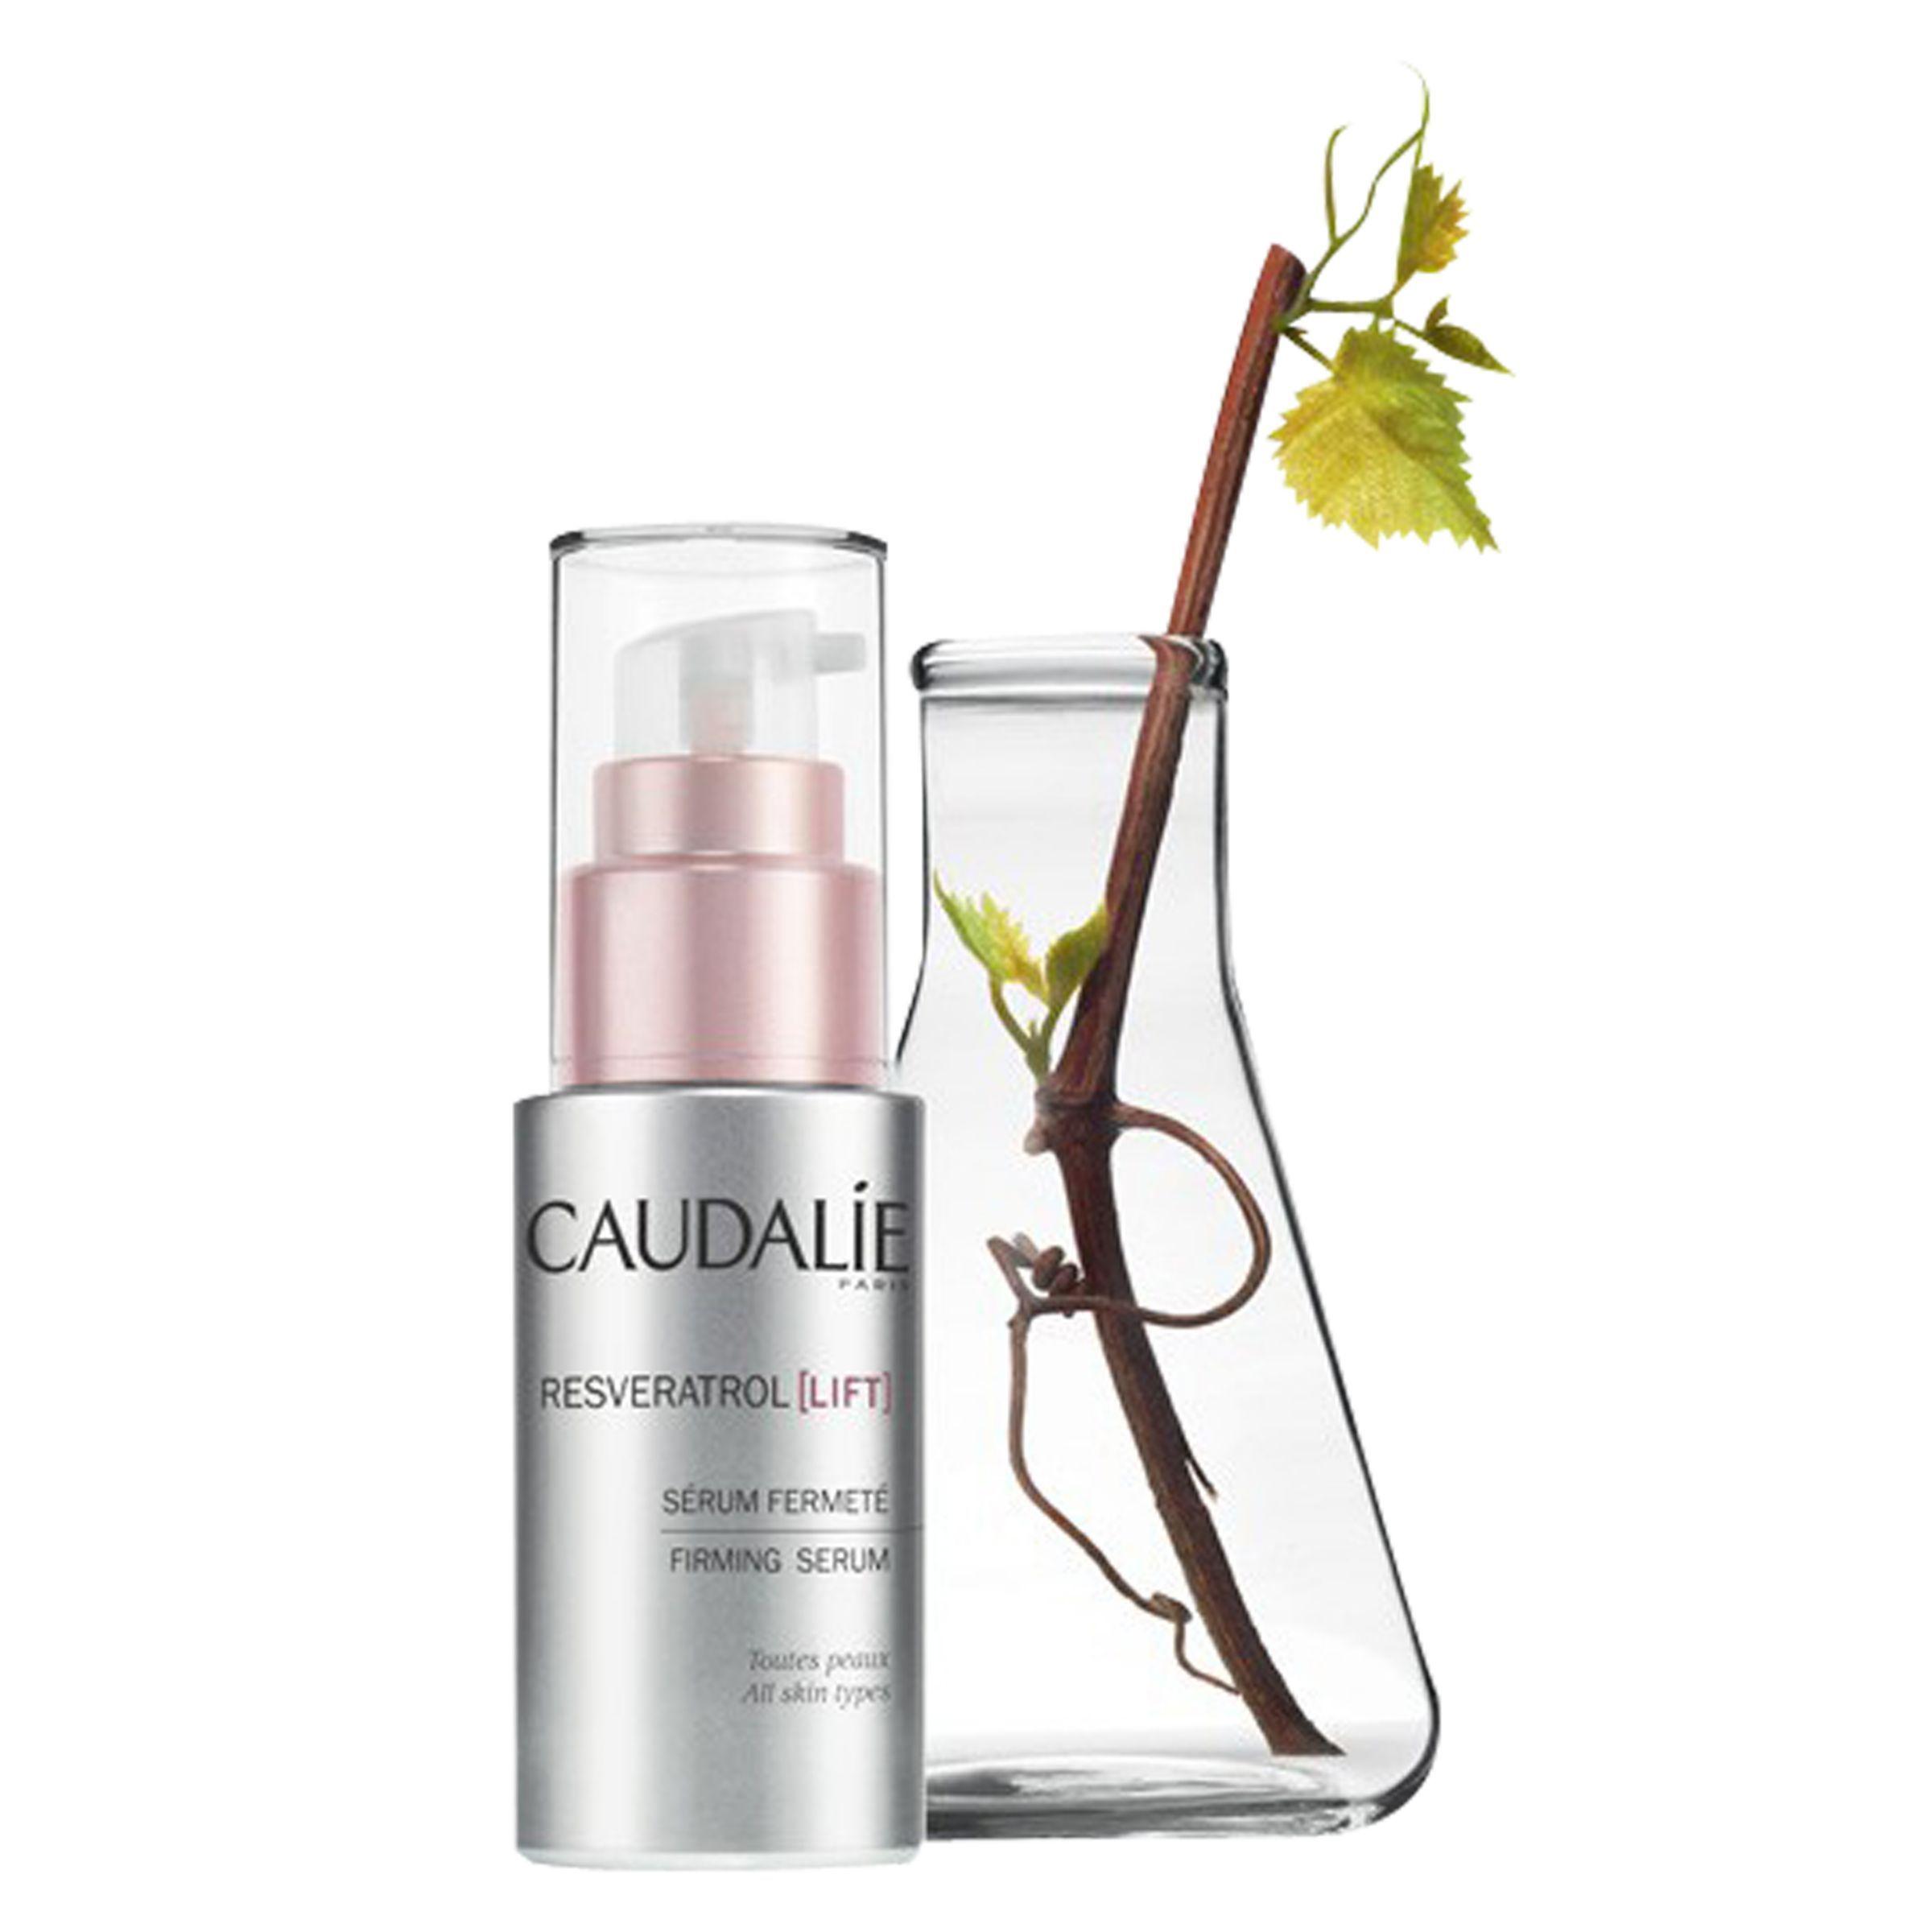 Caudalie Resveratrol Lift Firming Serum 30ml Firming Serum